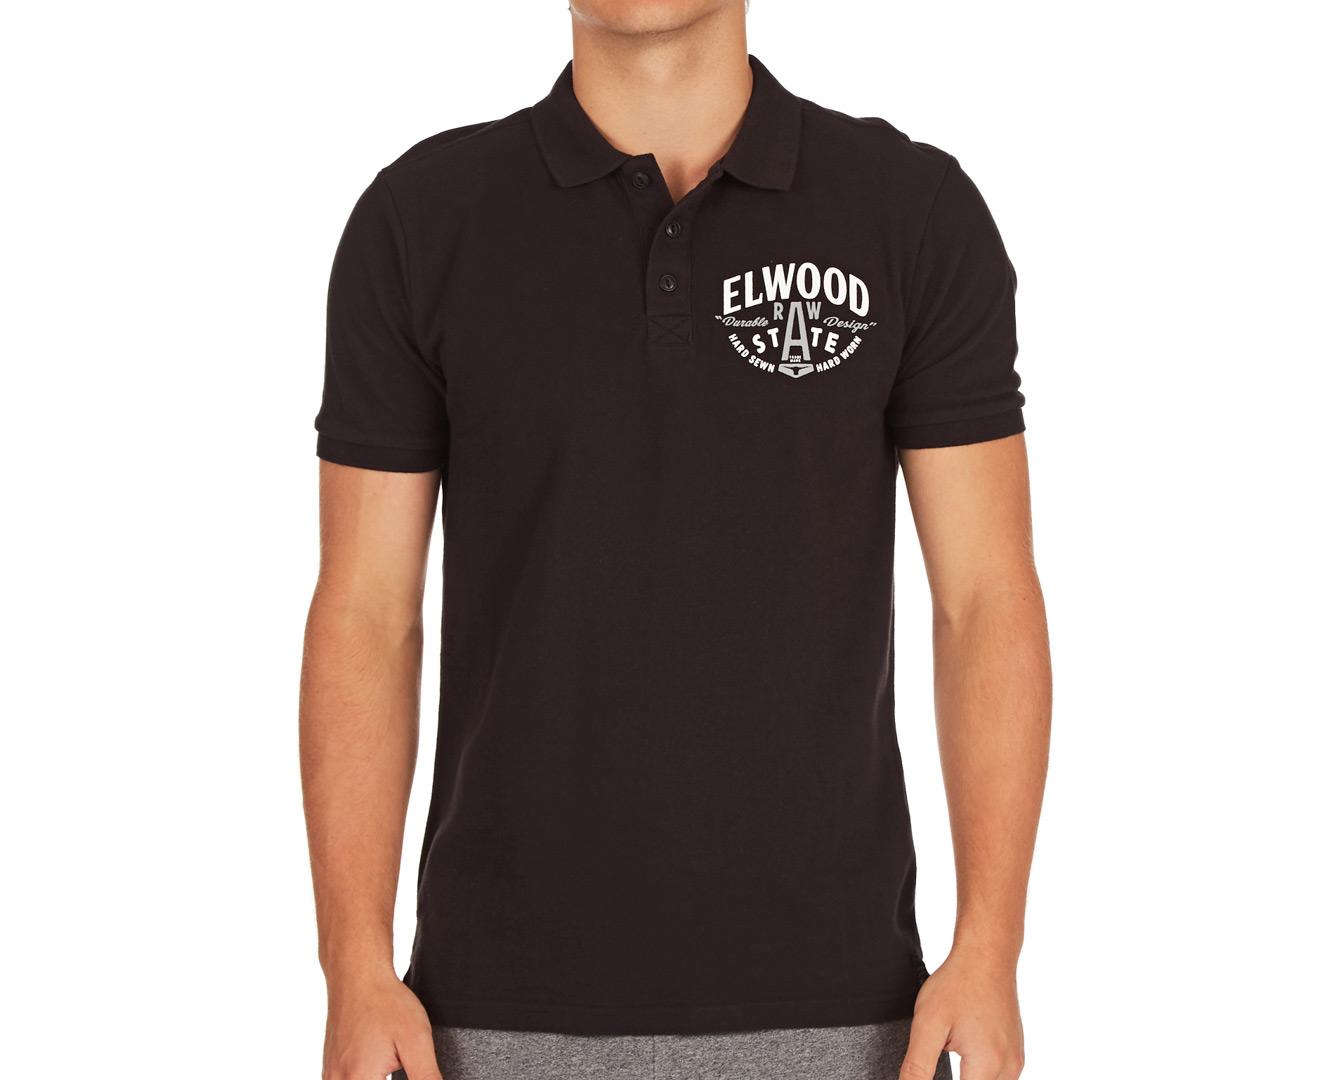 elwood men Elwood apparel for men & women - dresses, shirts, hoodies, playsuits & more.